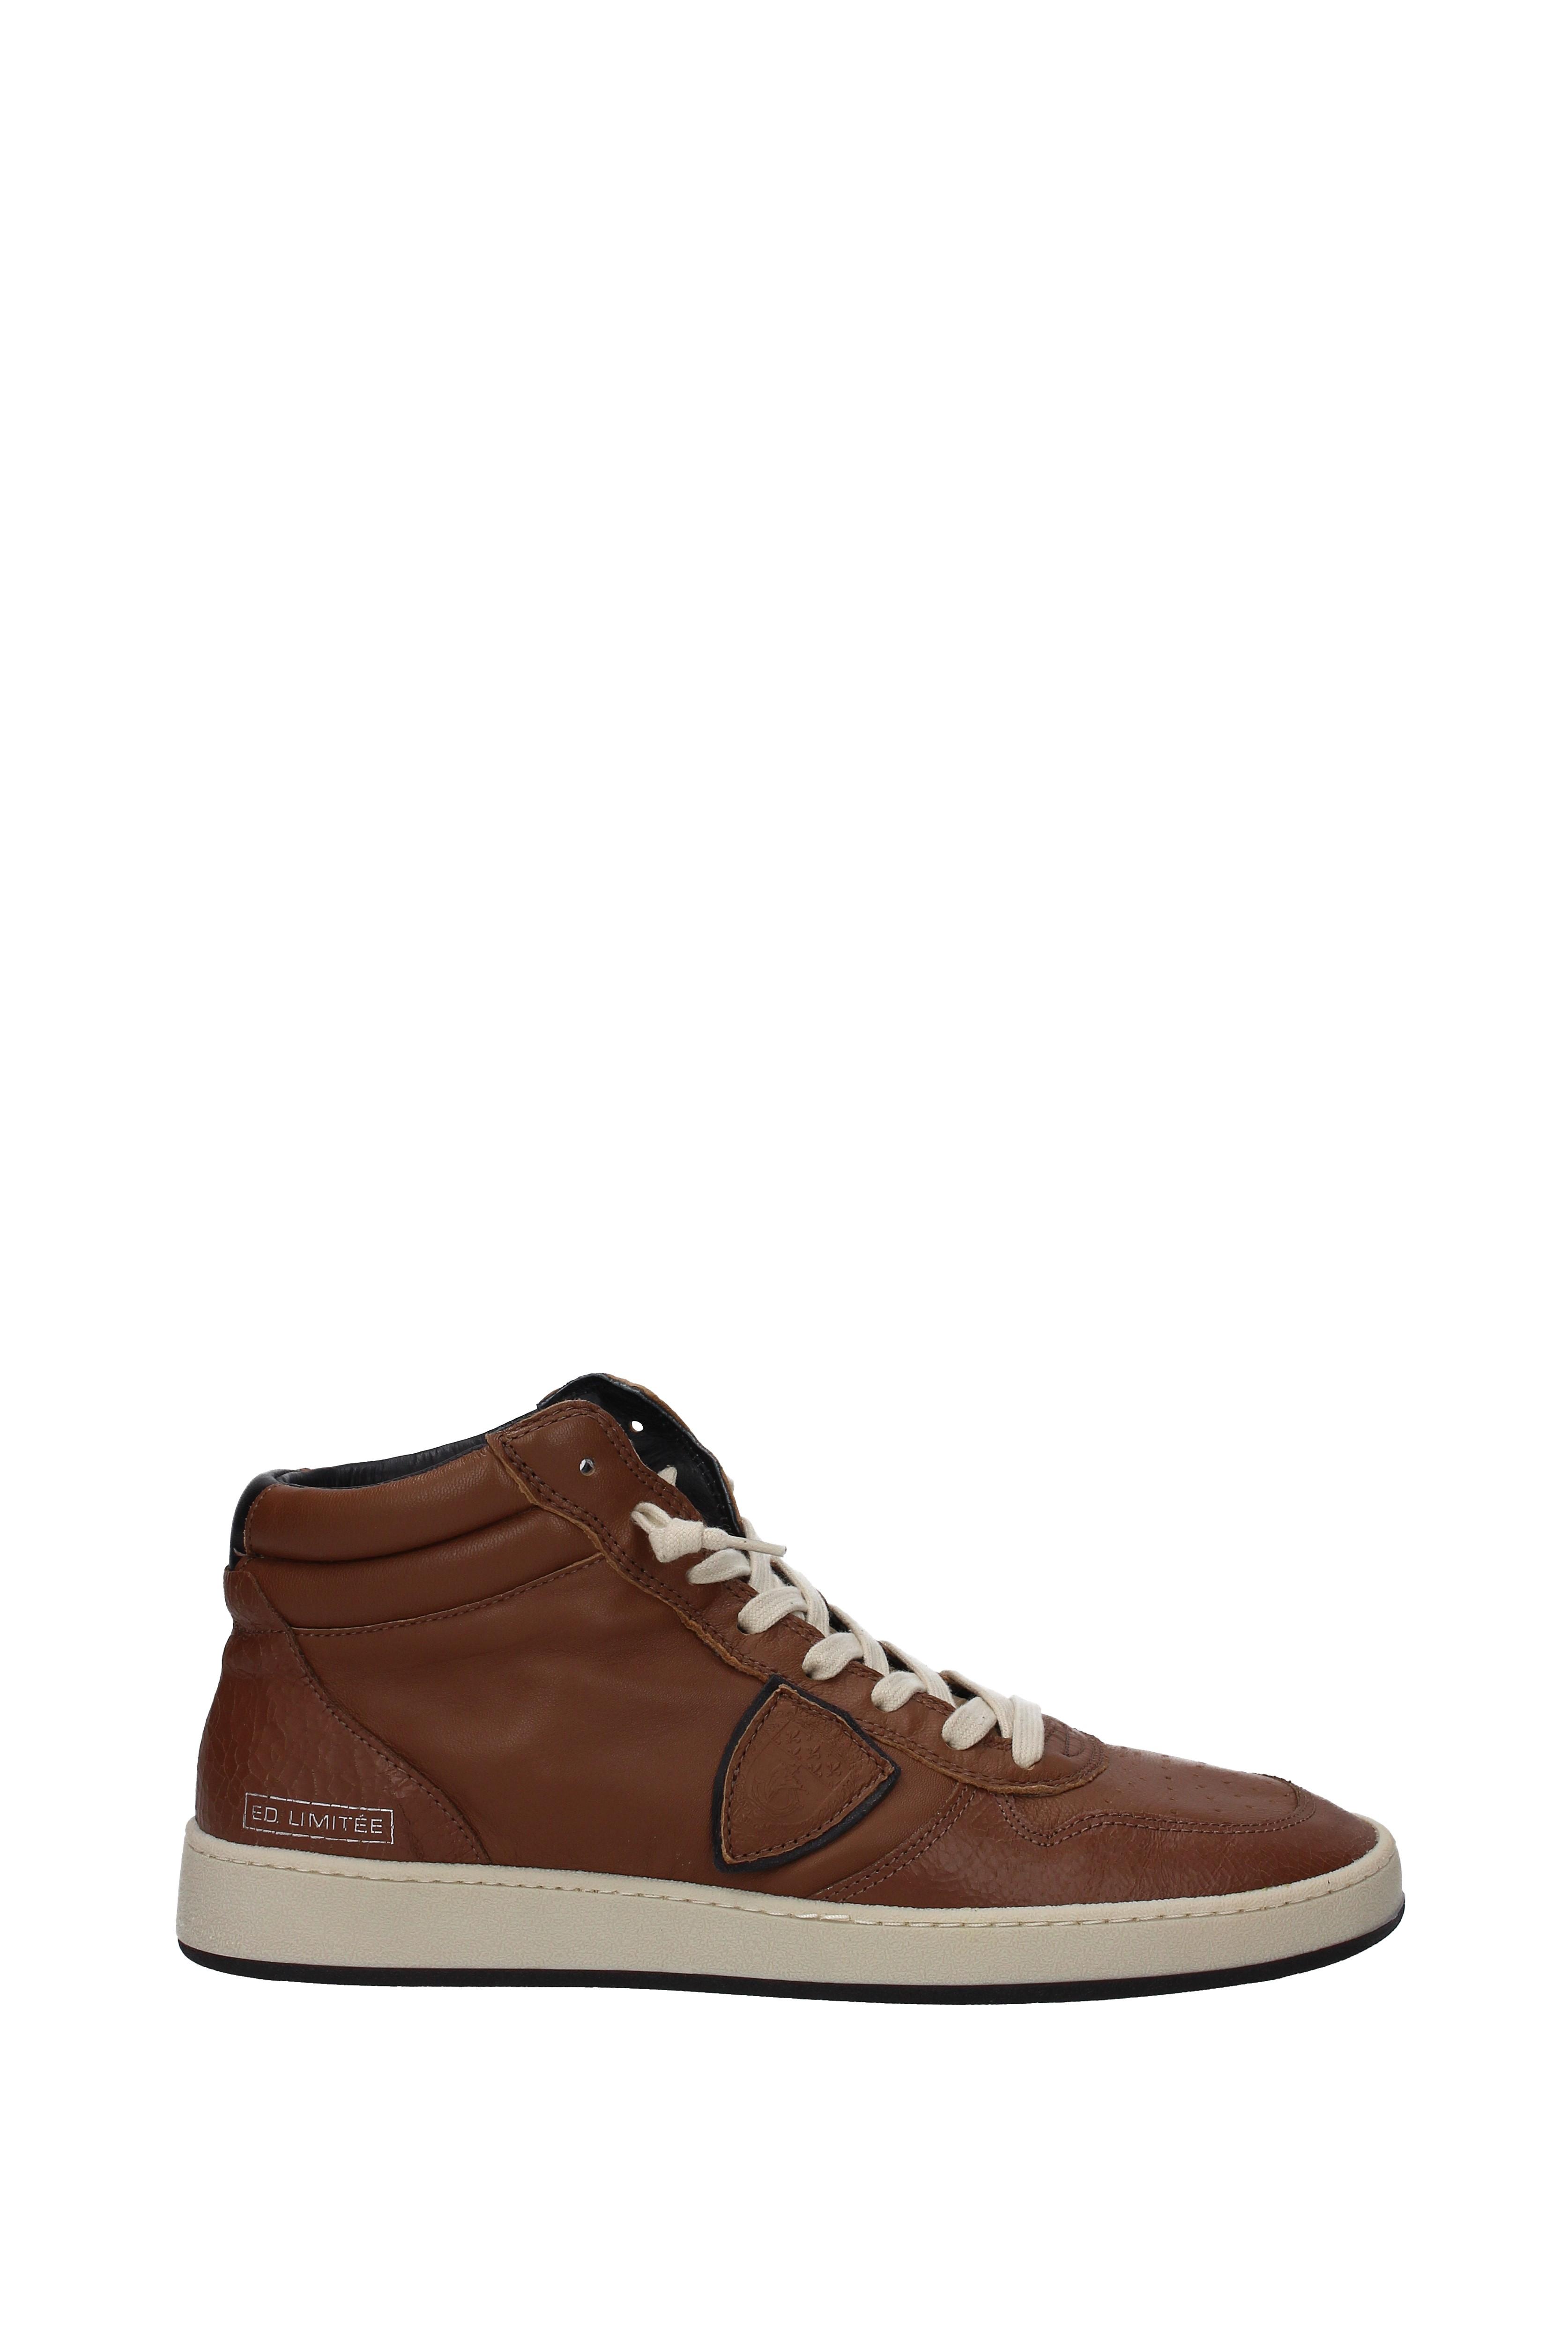 Scarpe casual da uomo  Sneakers Philippe Model ed limitèe uomo - Leather (LKHUVL)